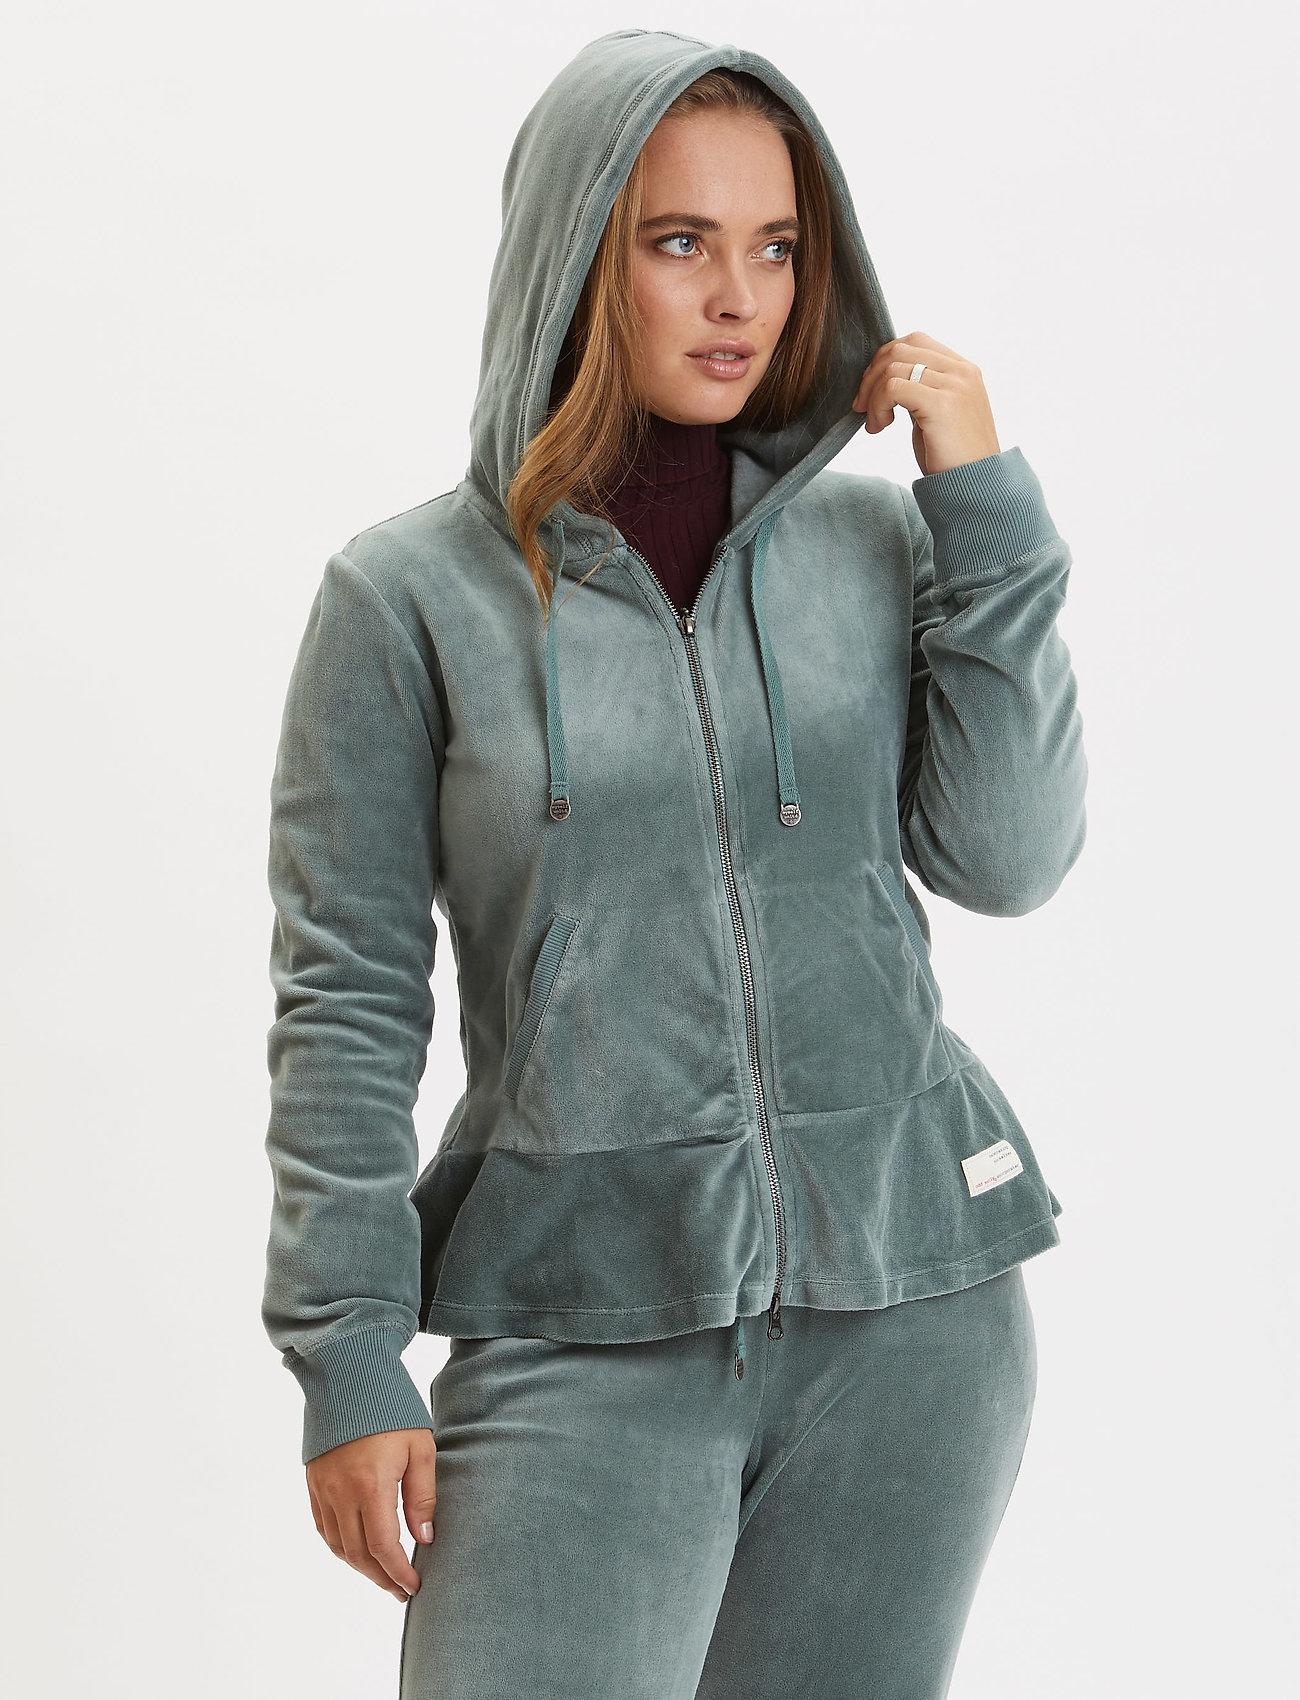 Odd Molly Hygge Jacket - Sweatshirts Cargo Green